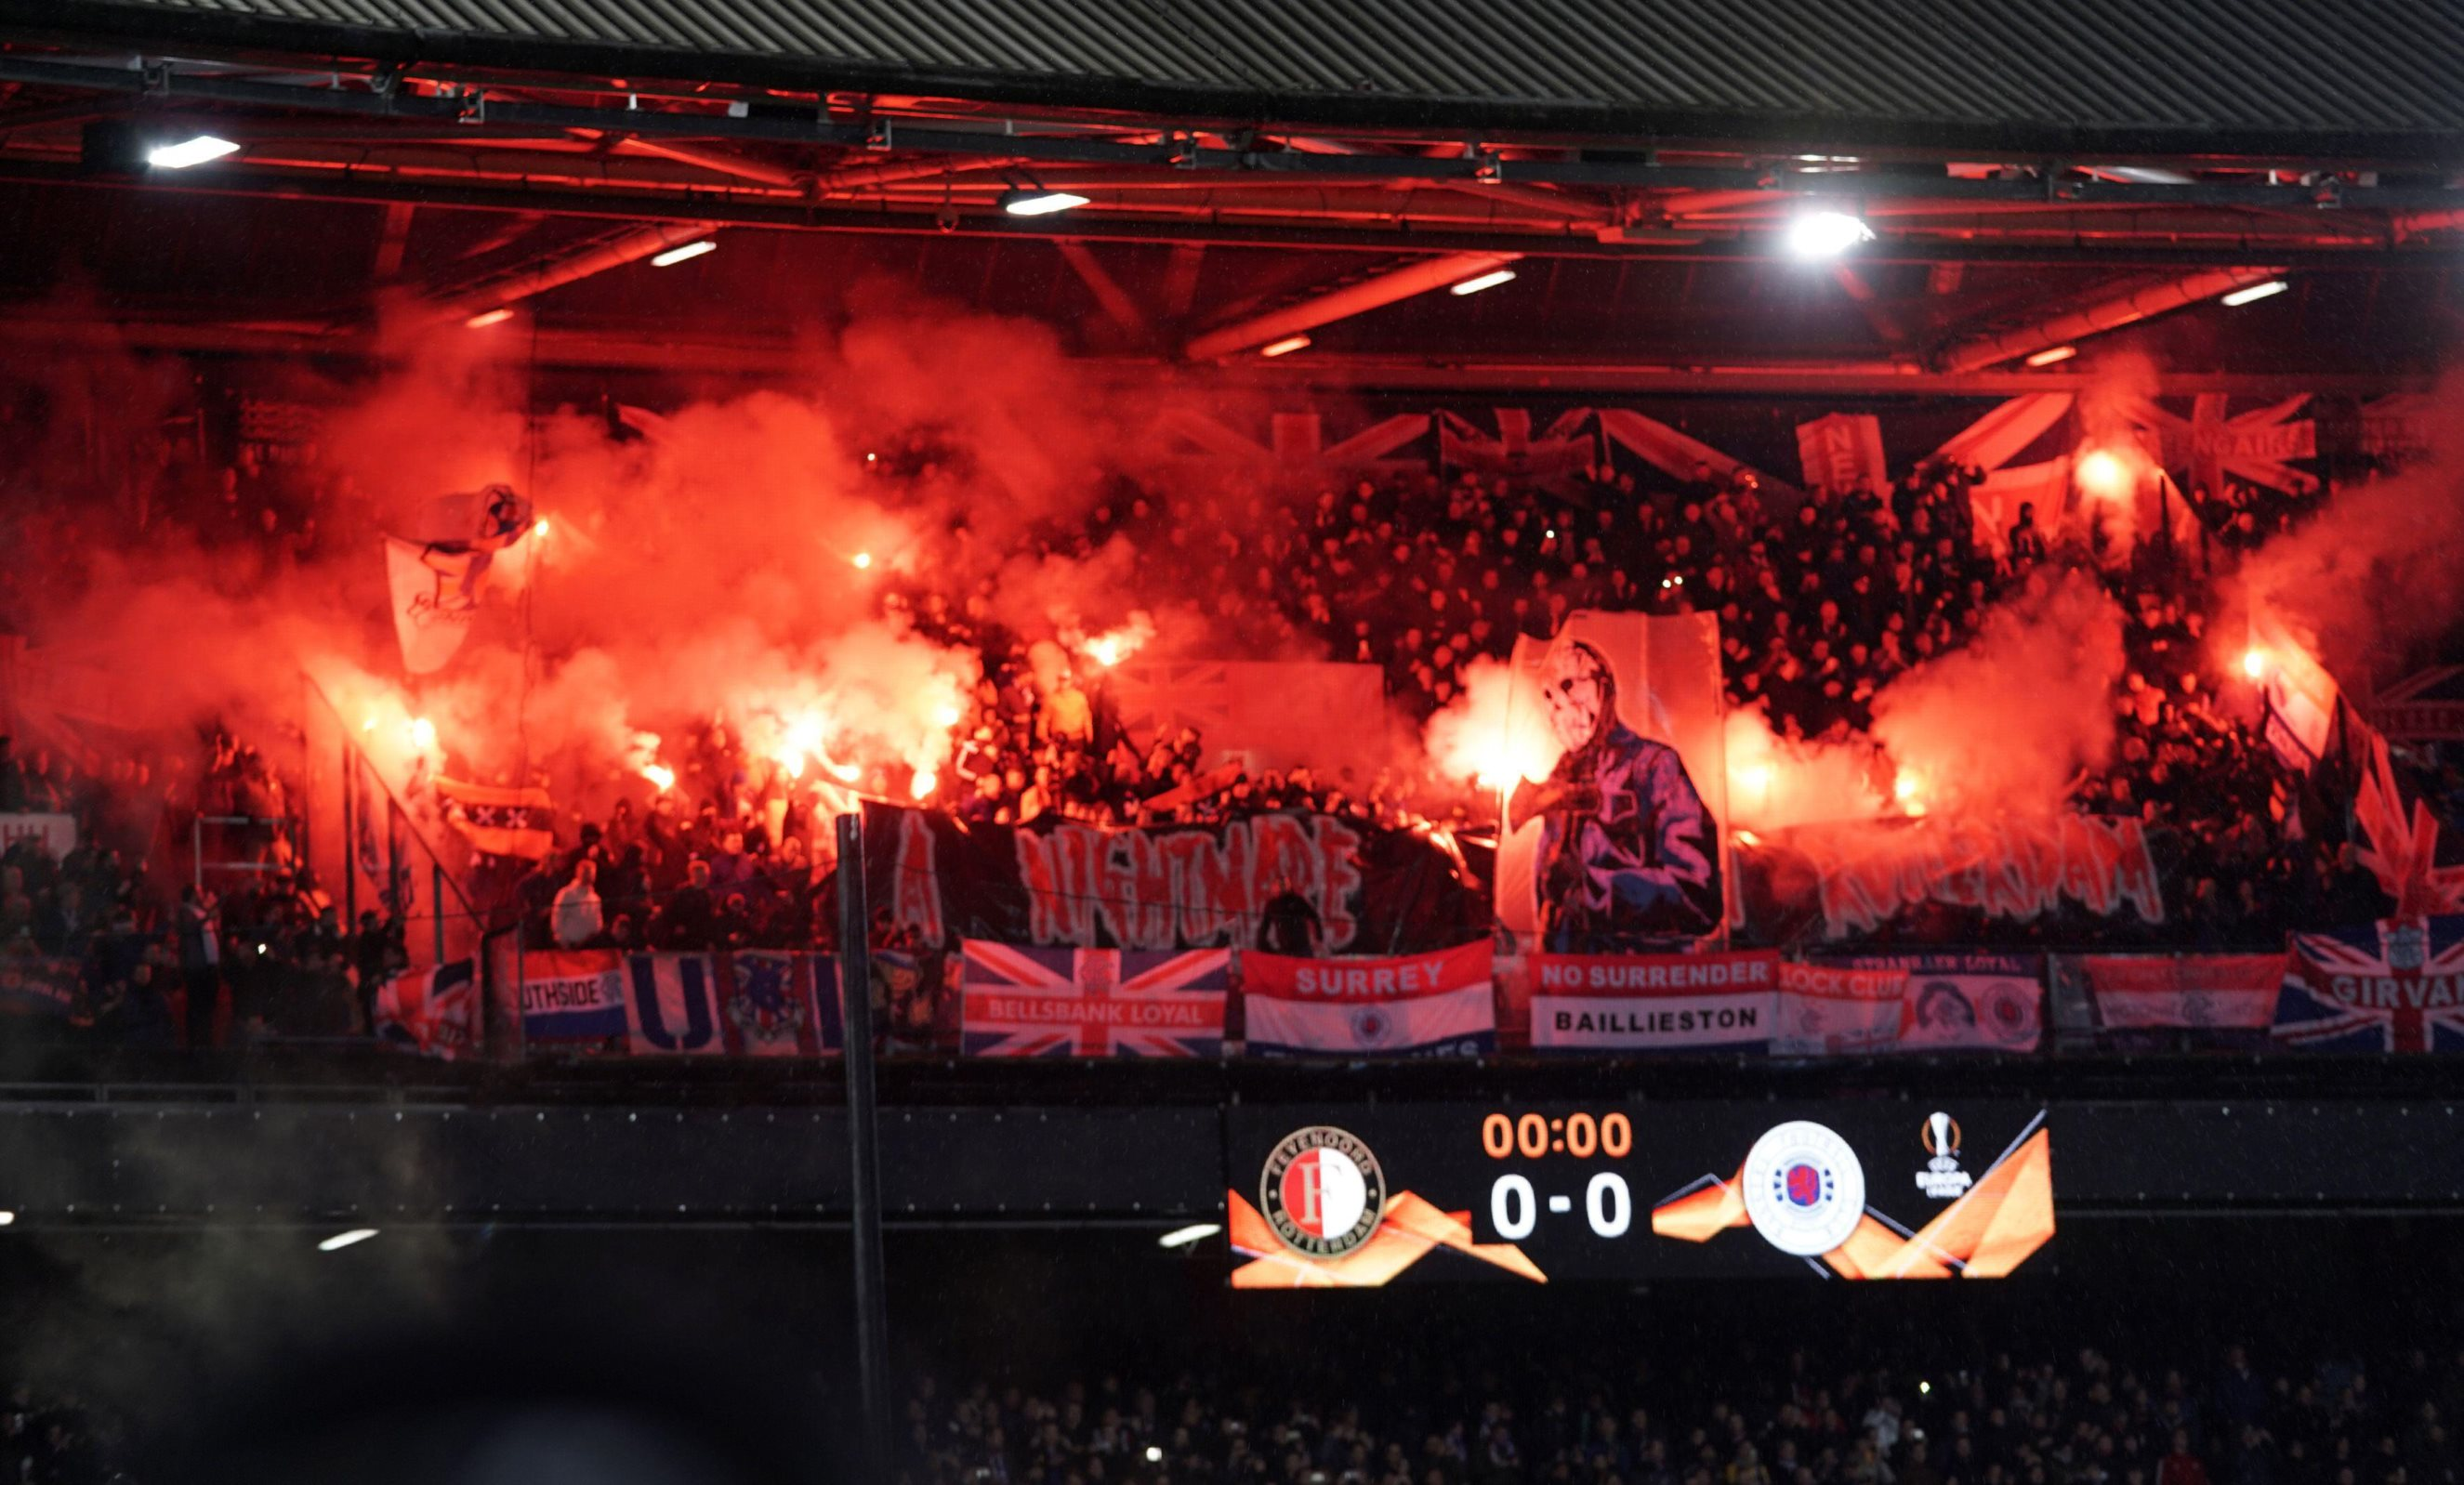 rangers in rotterdam 42 football fans